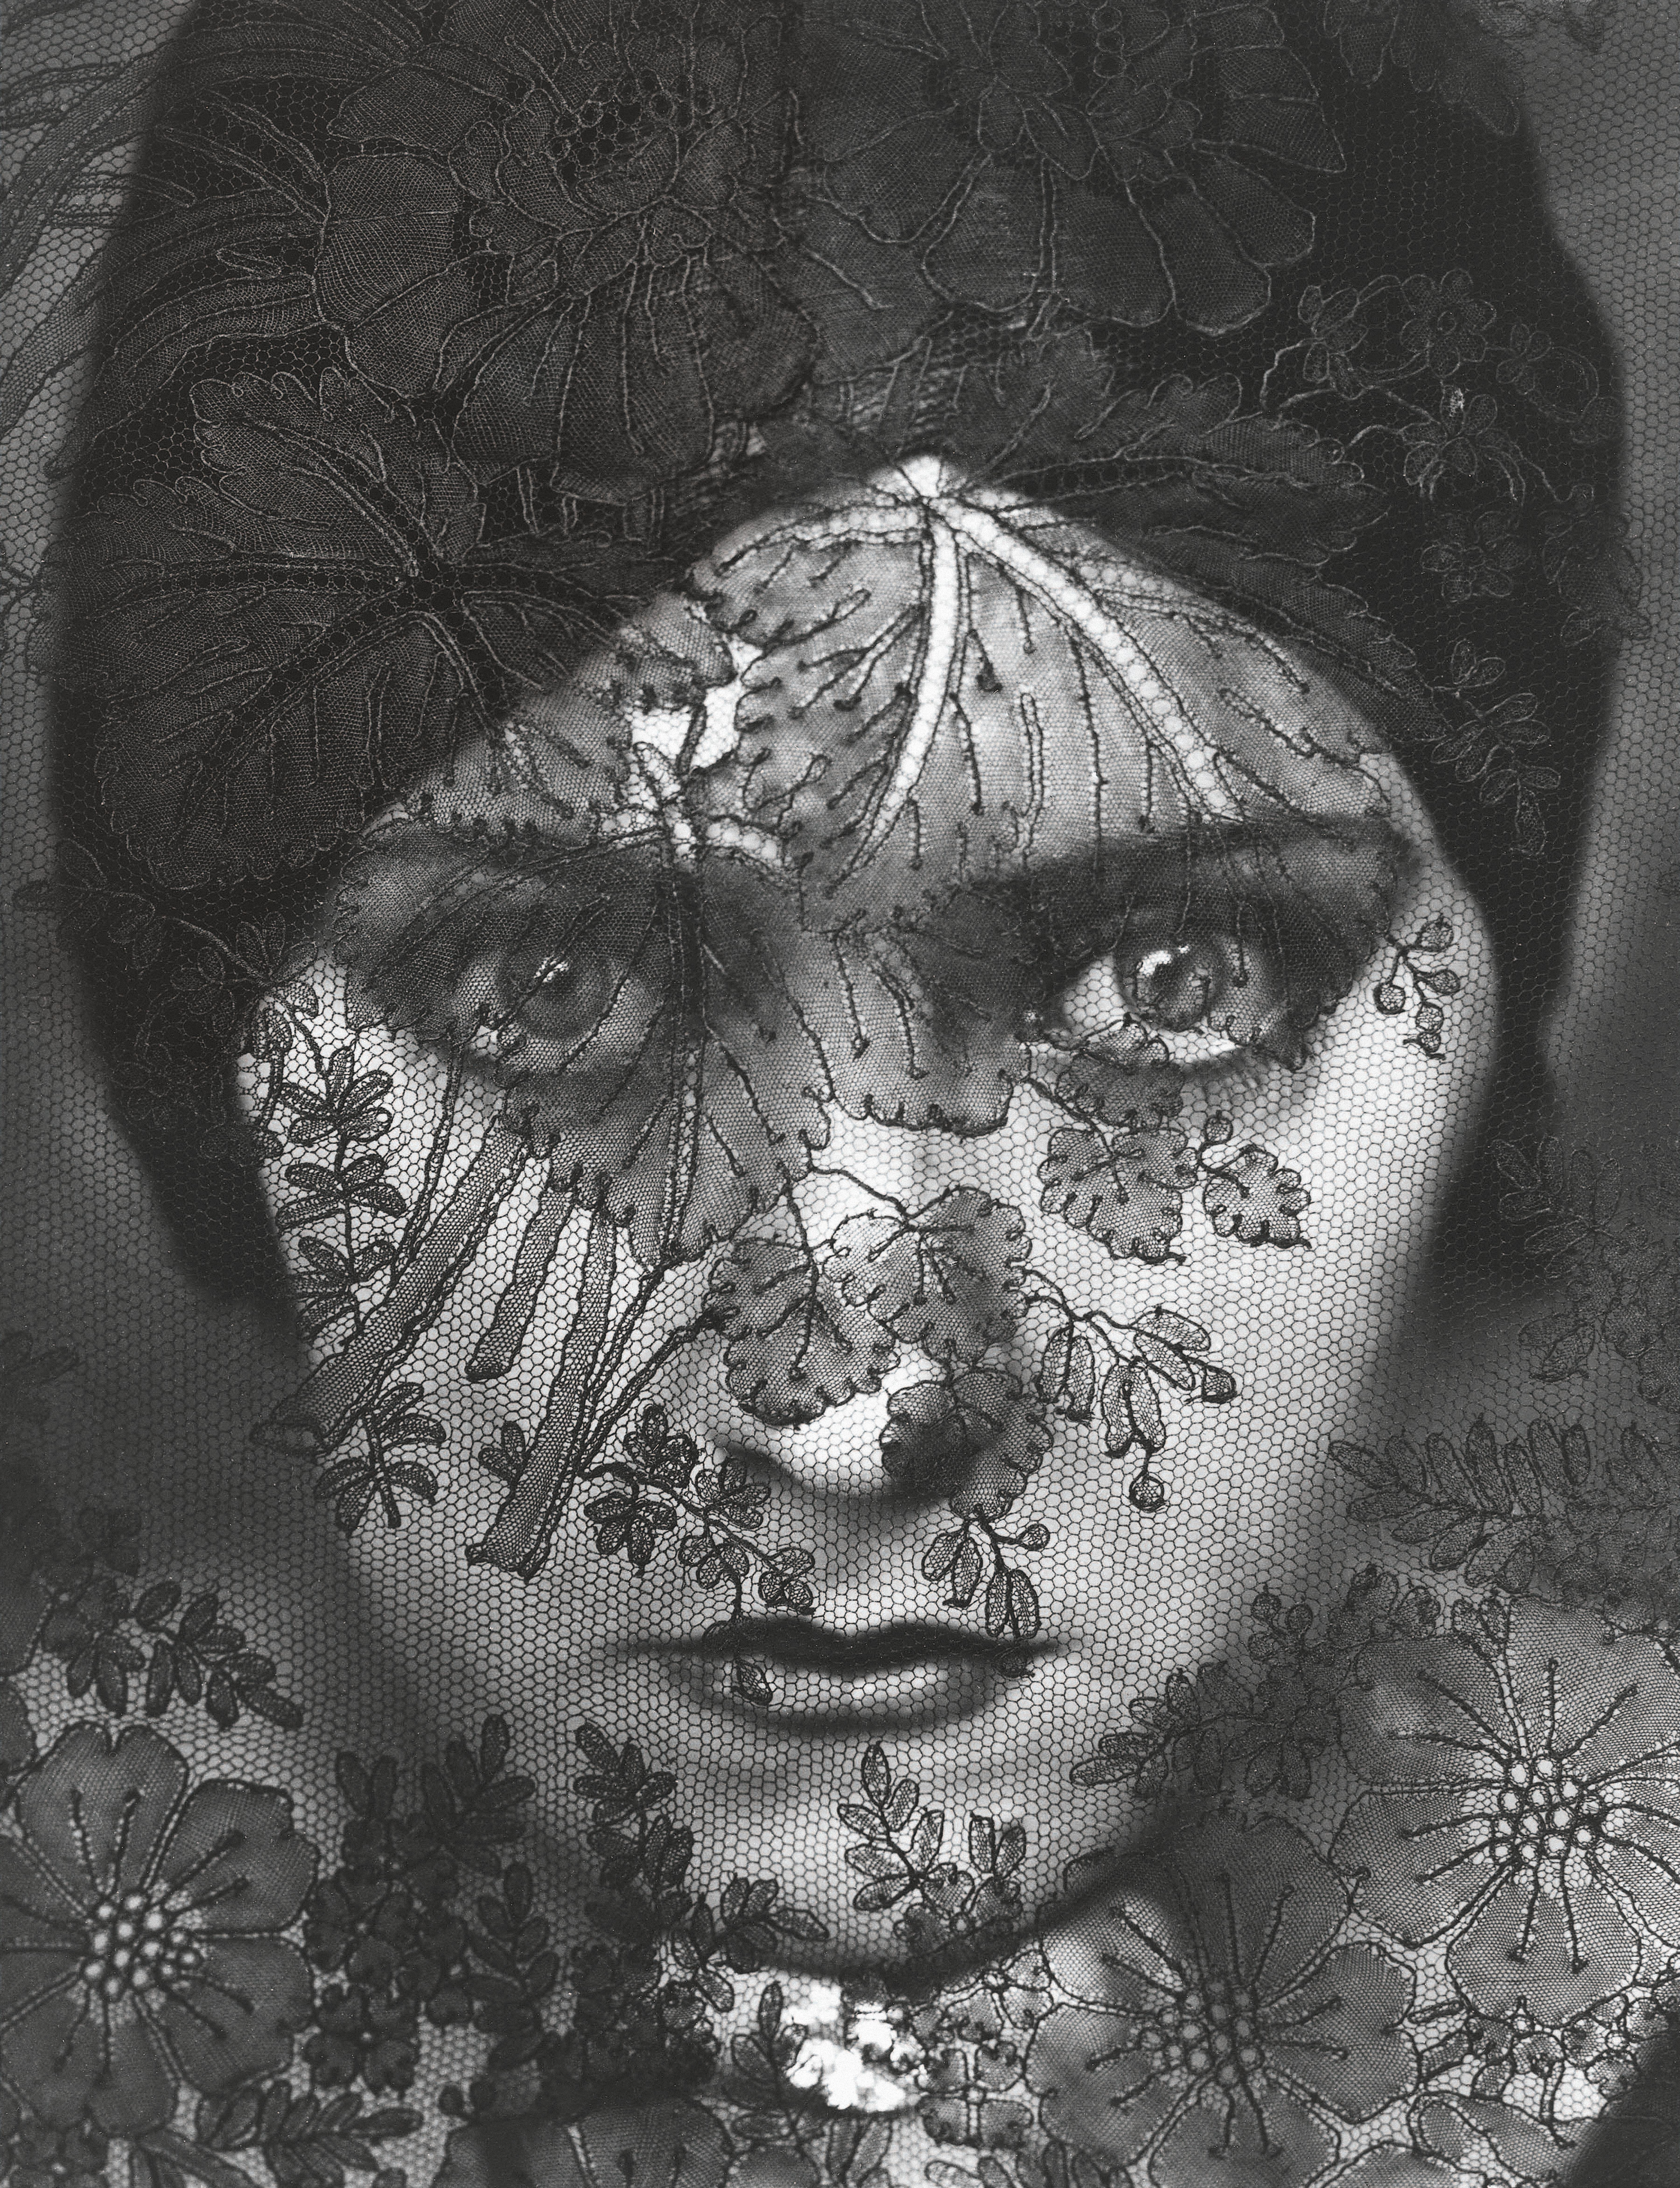 Actress Gloria Swanson for Vanity Fair, February 1928.